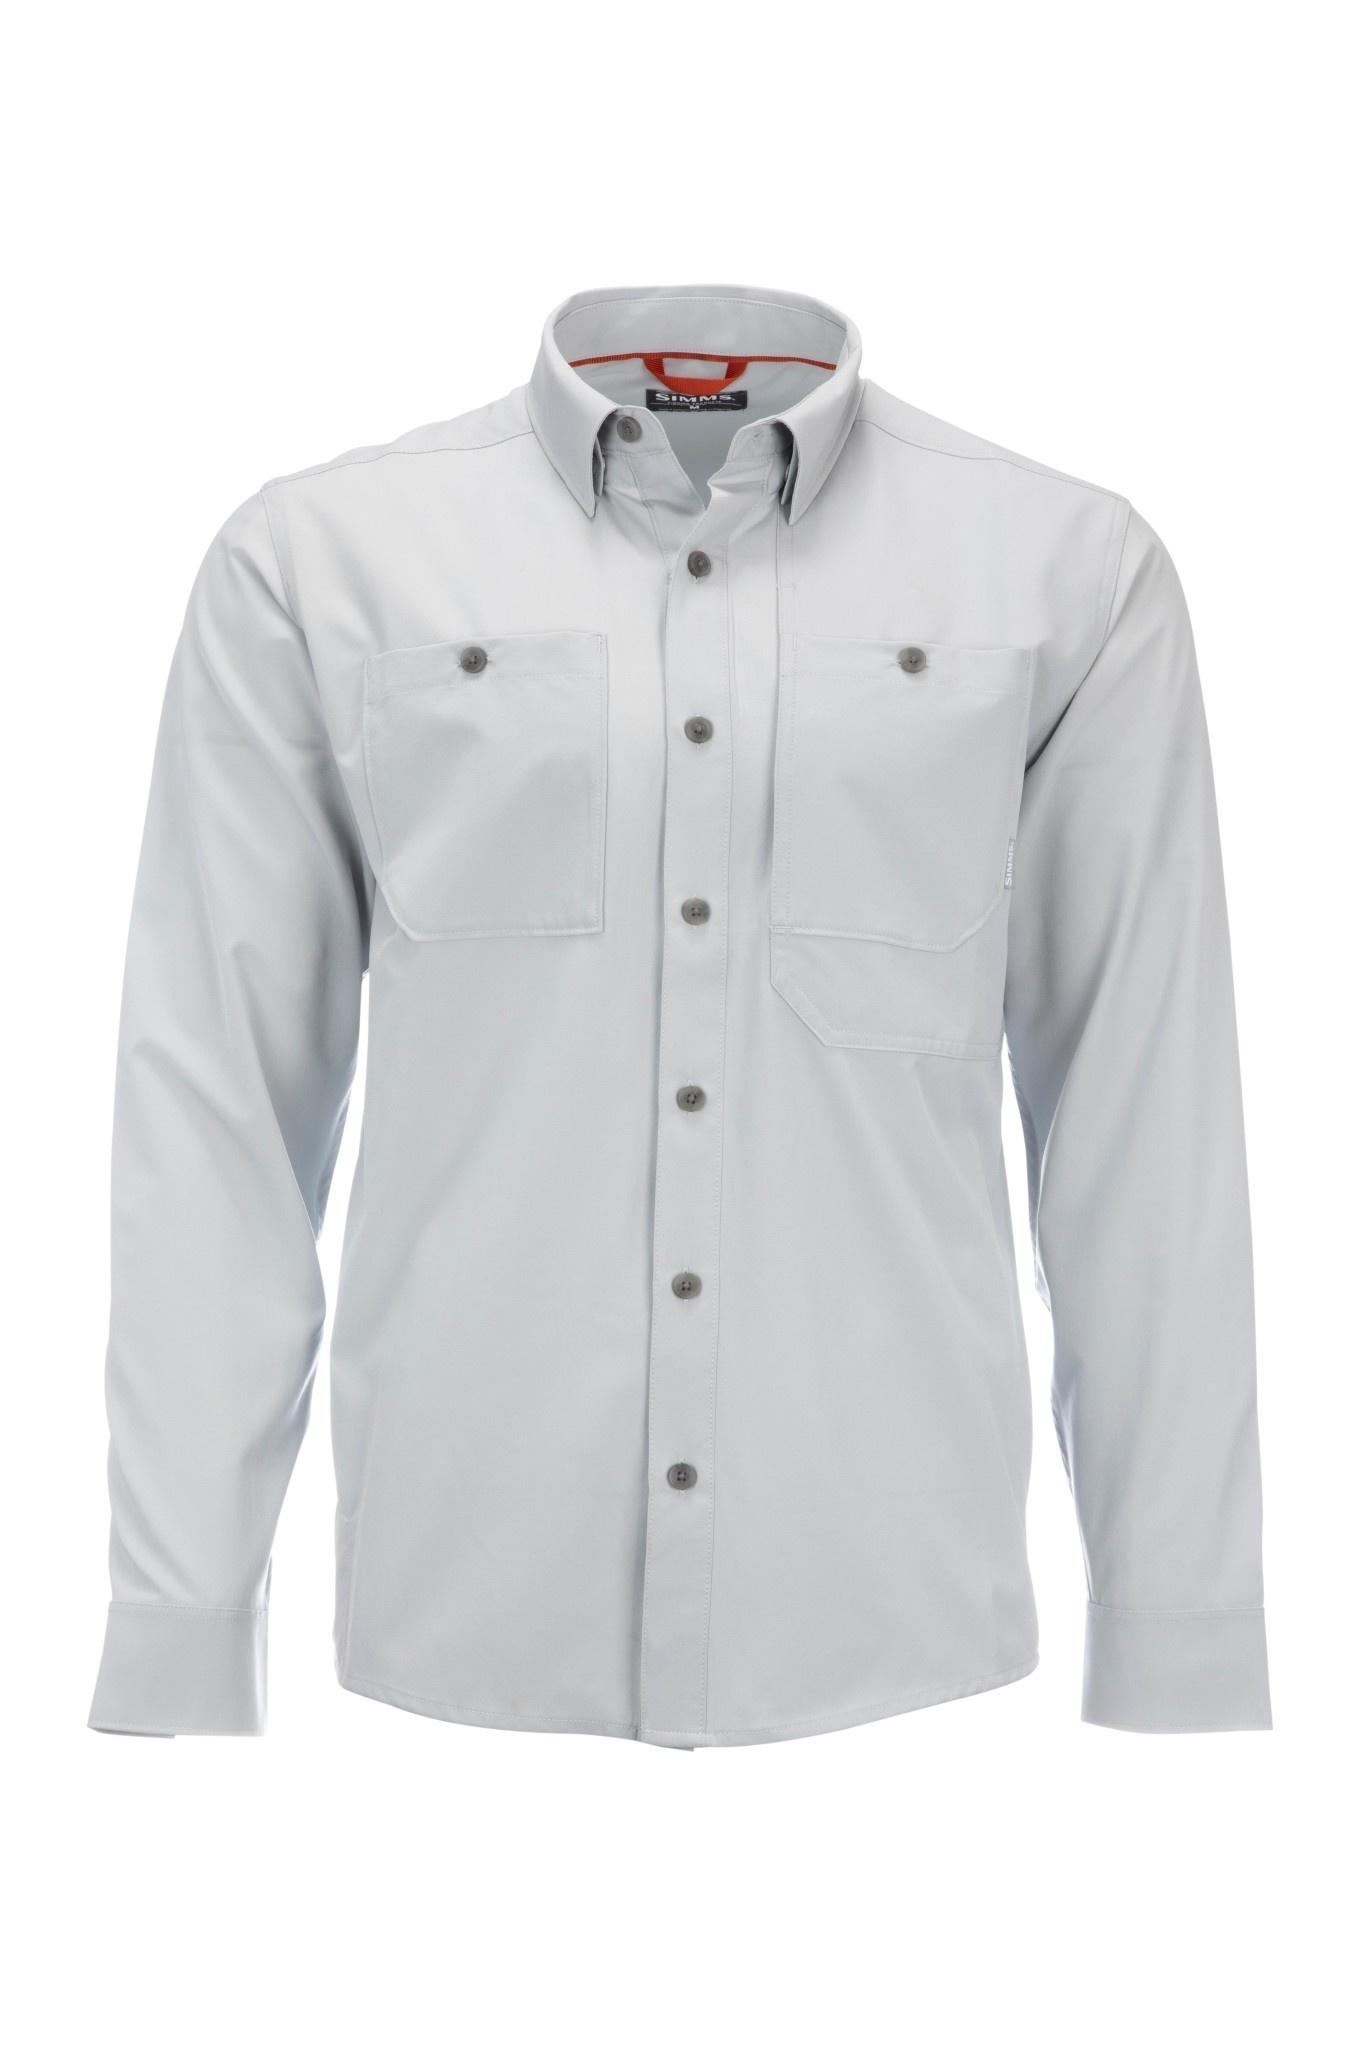 Simms Simms Double Haul Shirt